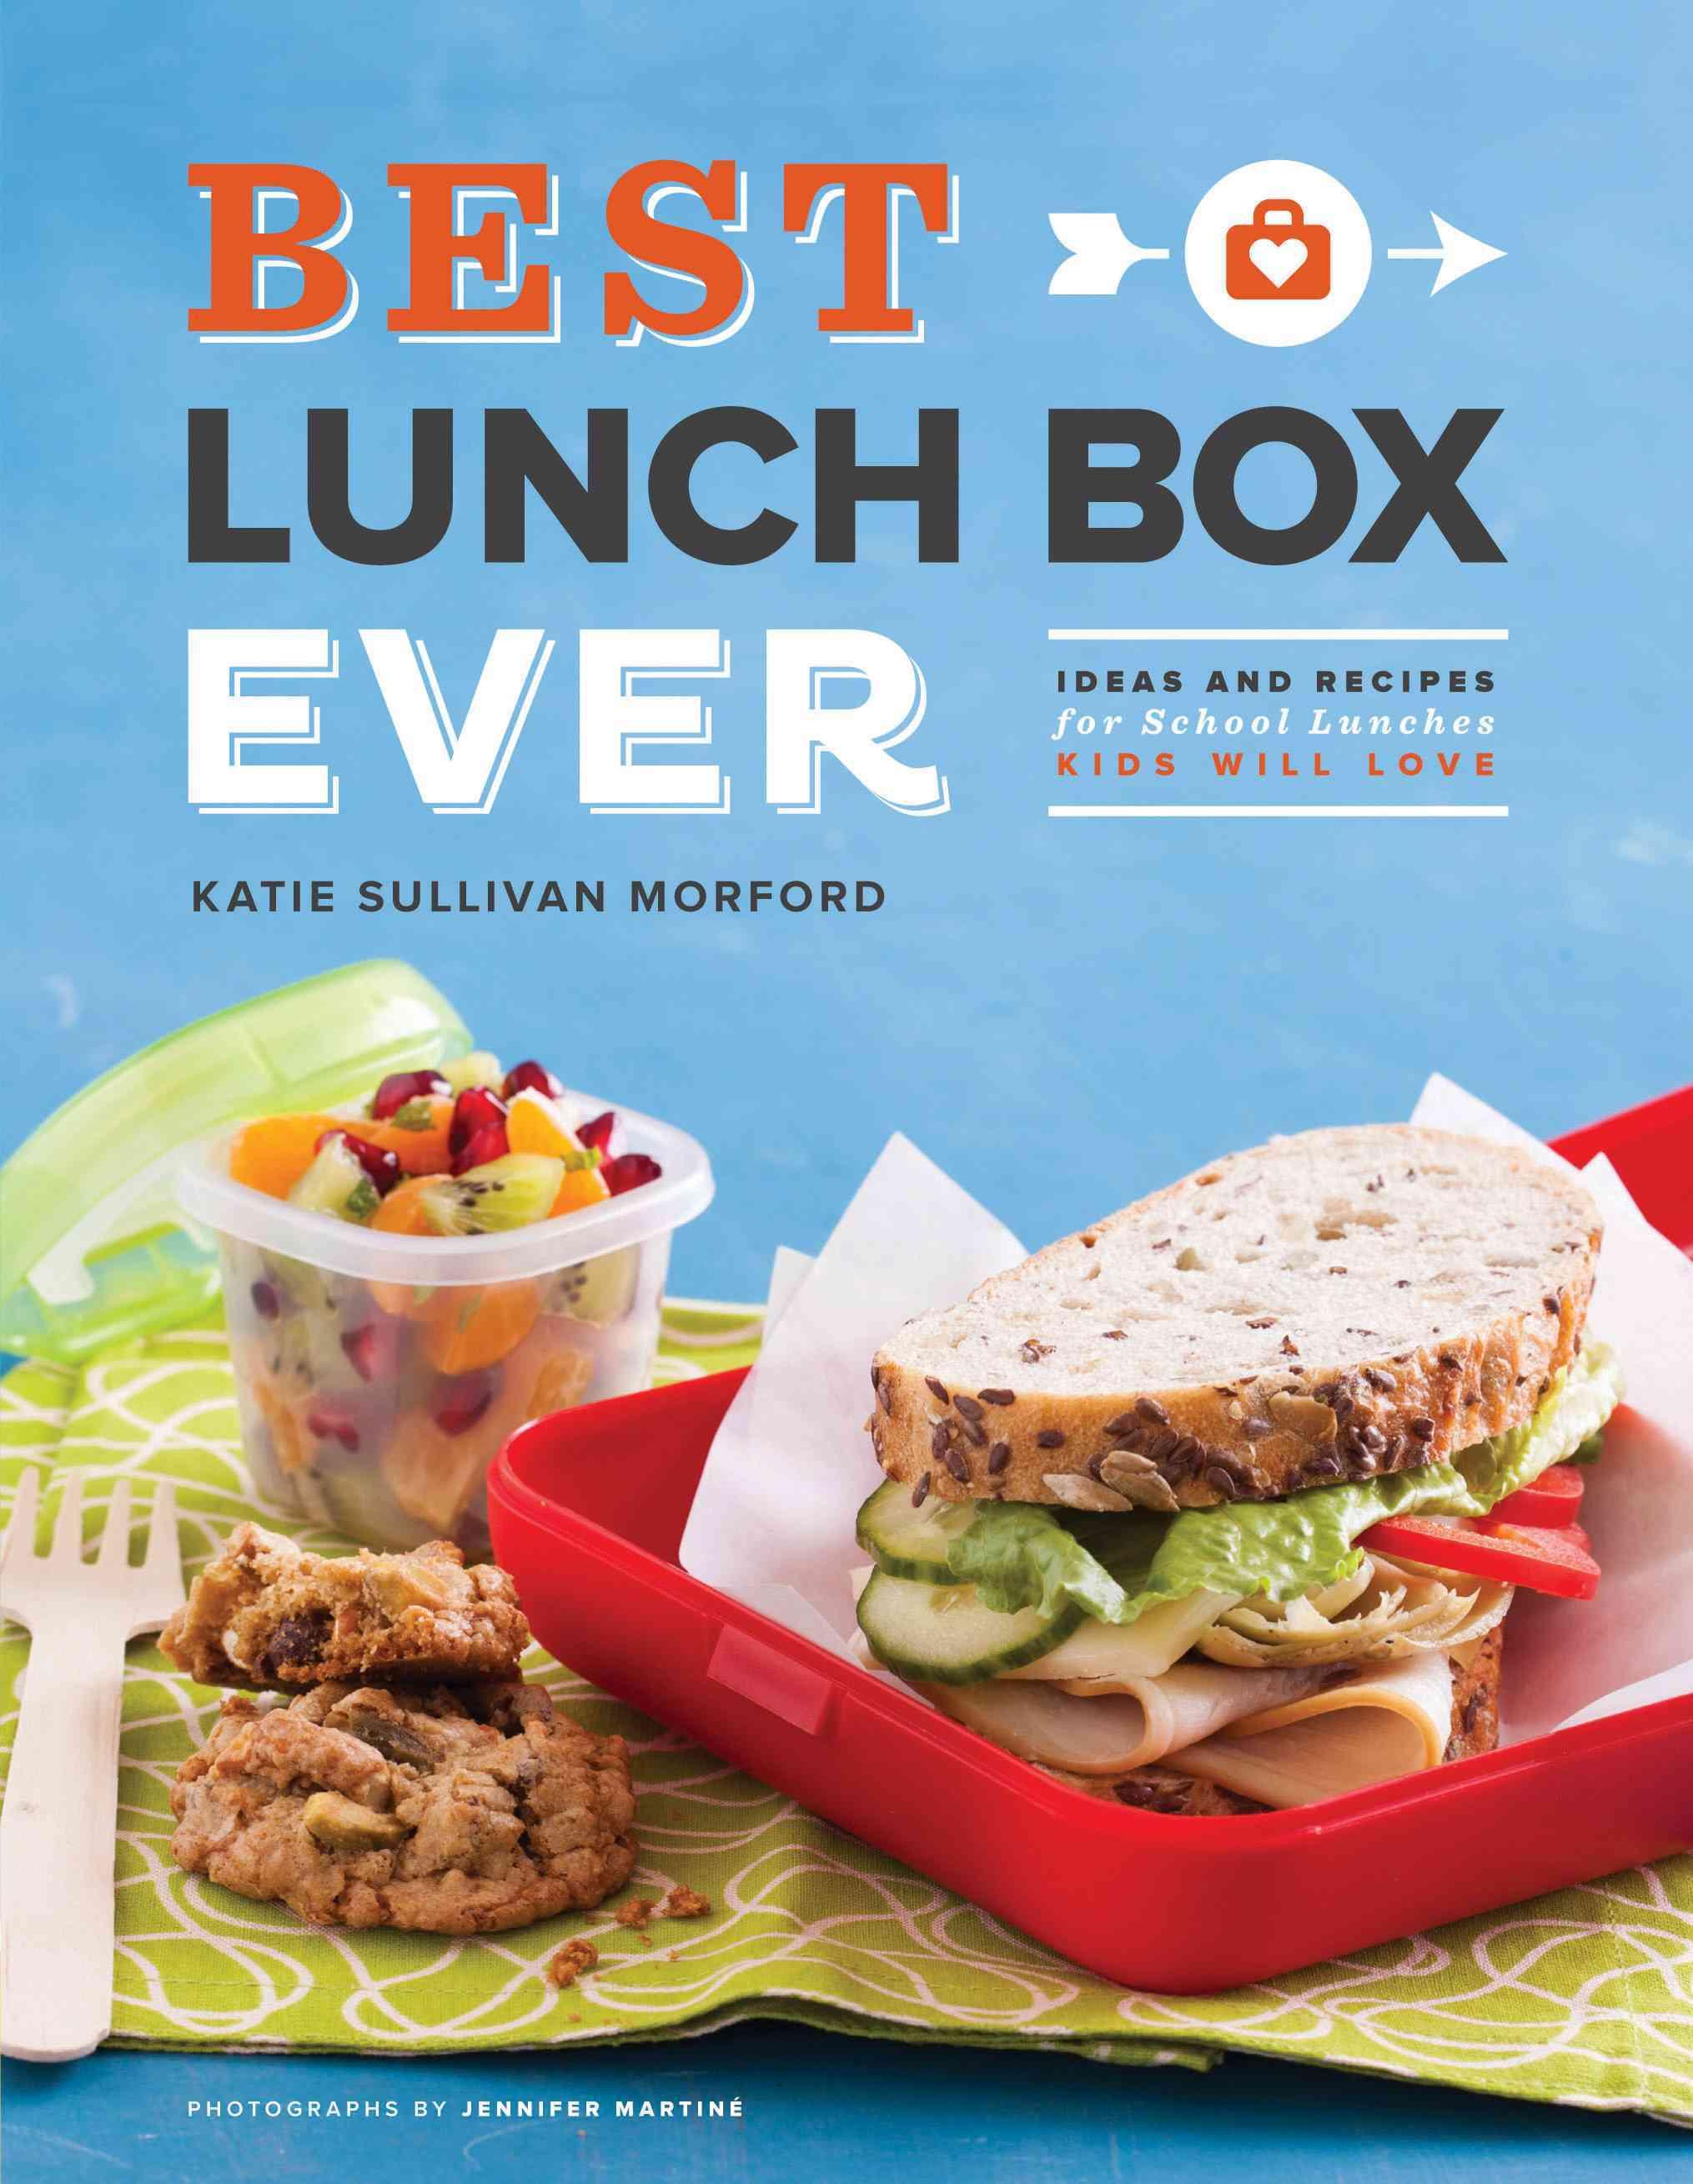 Best Lunch Box Ever By Morford, Katie Sullivan